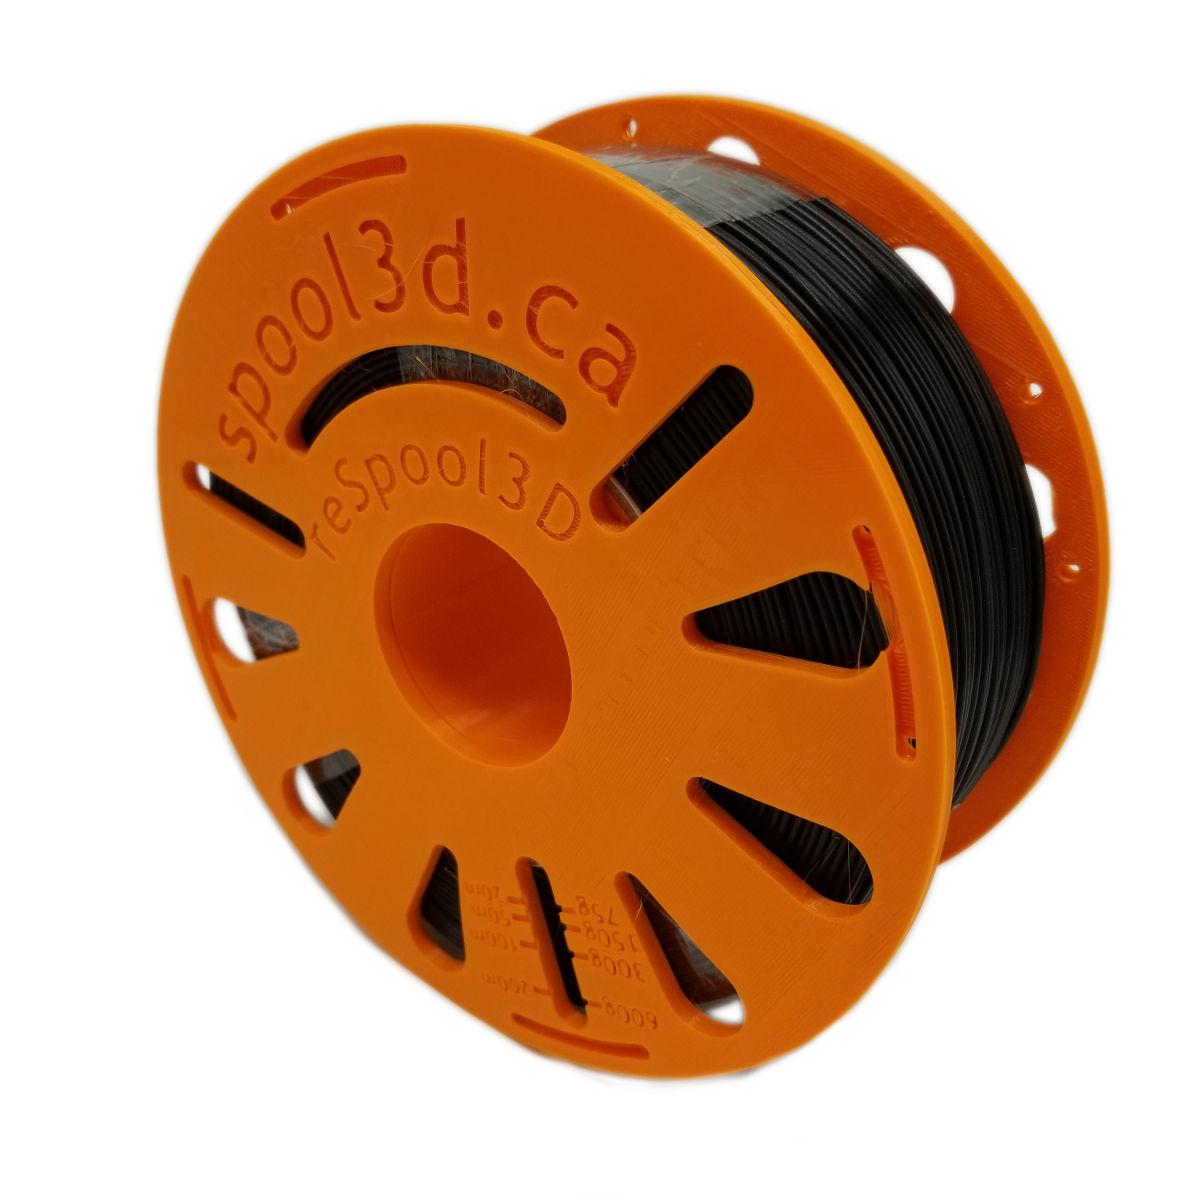 Black 1.75mm ABS 3D Printer Filament reSpool3D Masterspool Refill Coil - 3D Printing Canada